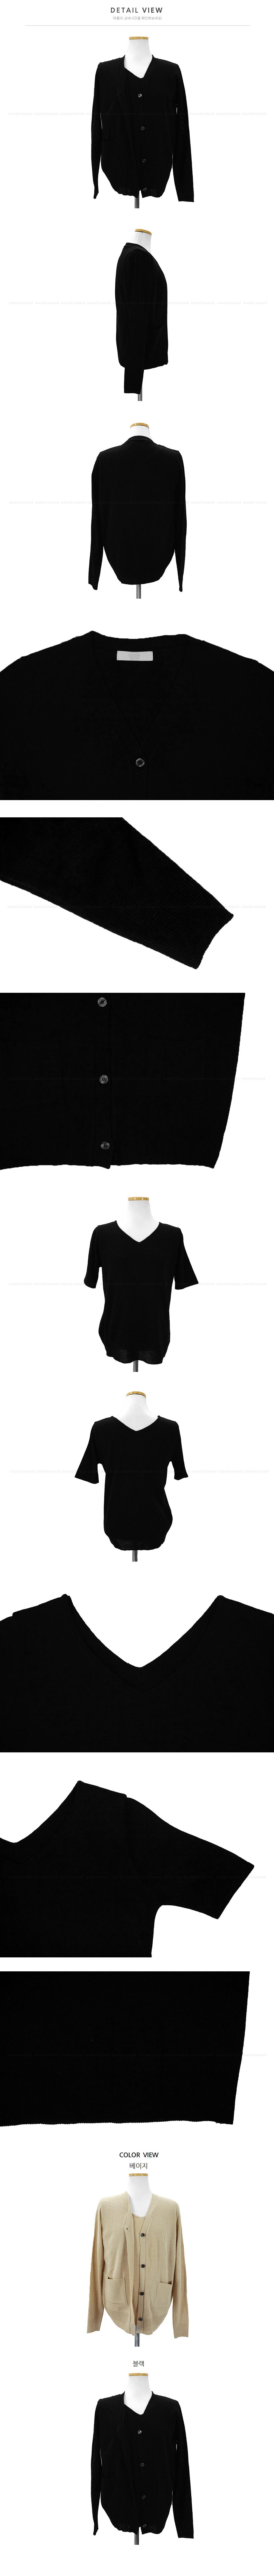 Eve V-neck short sleeve knit pocket cardigan set